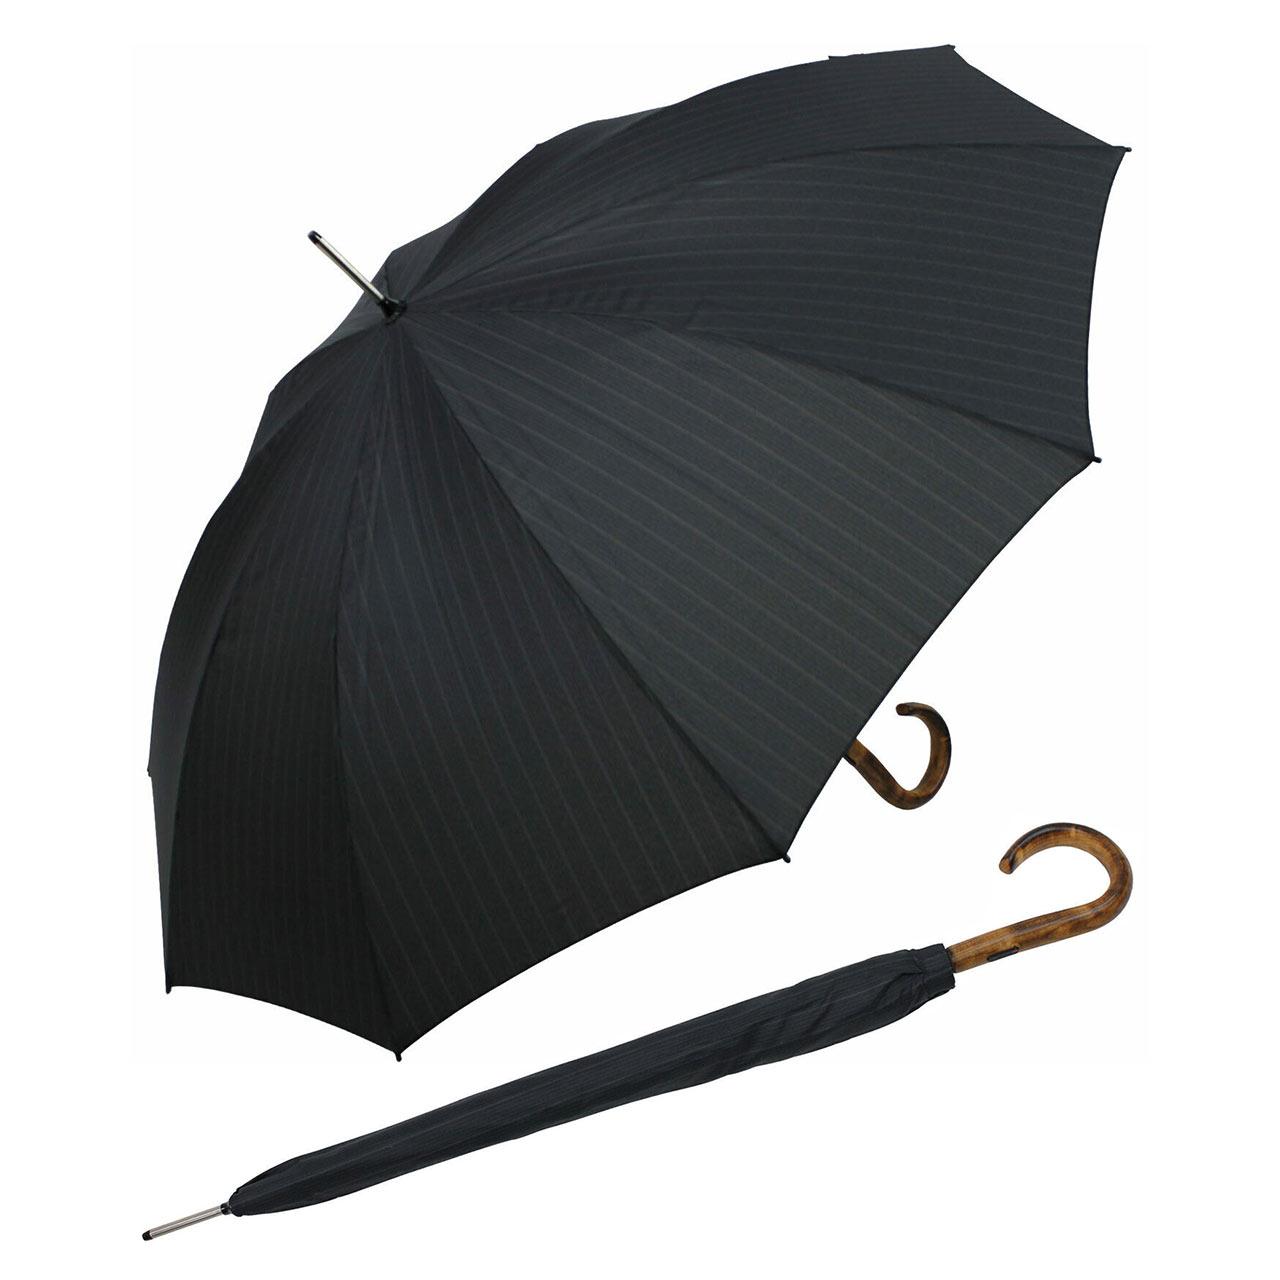 KNIRPS stick umbrella SL 923 Stripes | the design gift shop